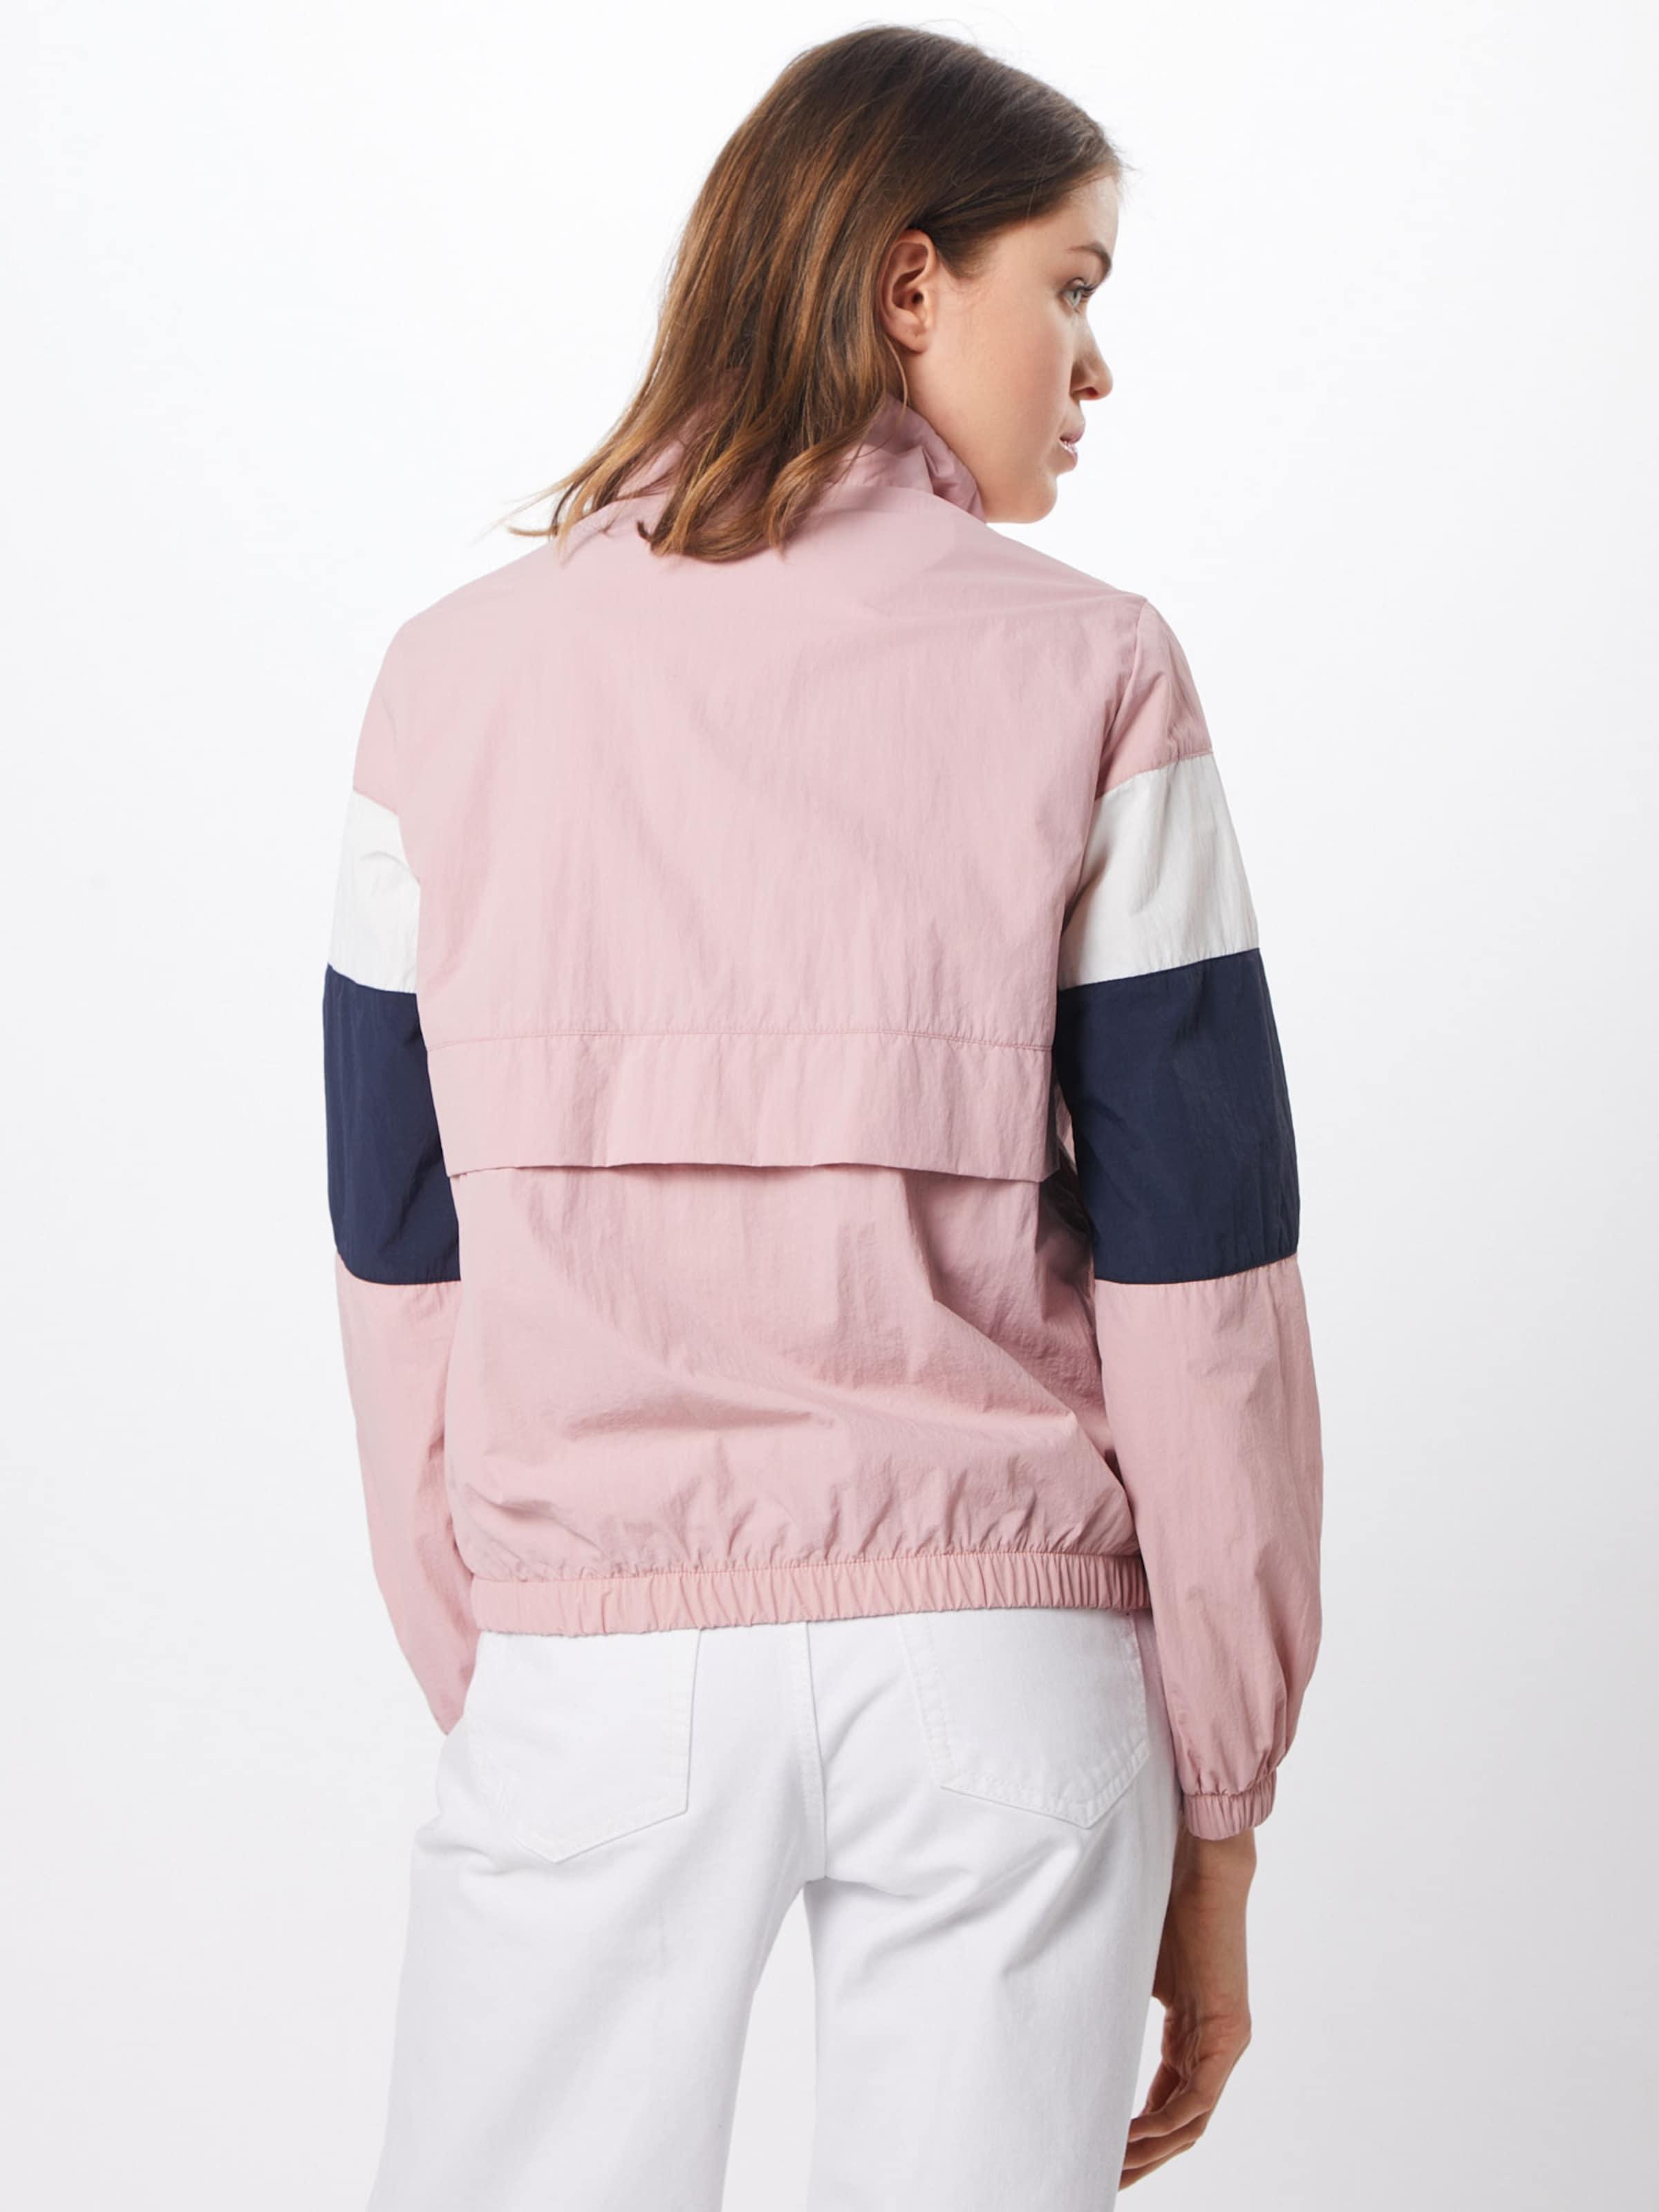 In 3 Crinkle tone Classics Rosa Jacke Urban 'ladies Track Jacket' qUpSzMV